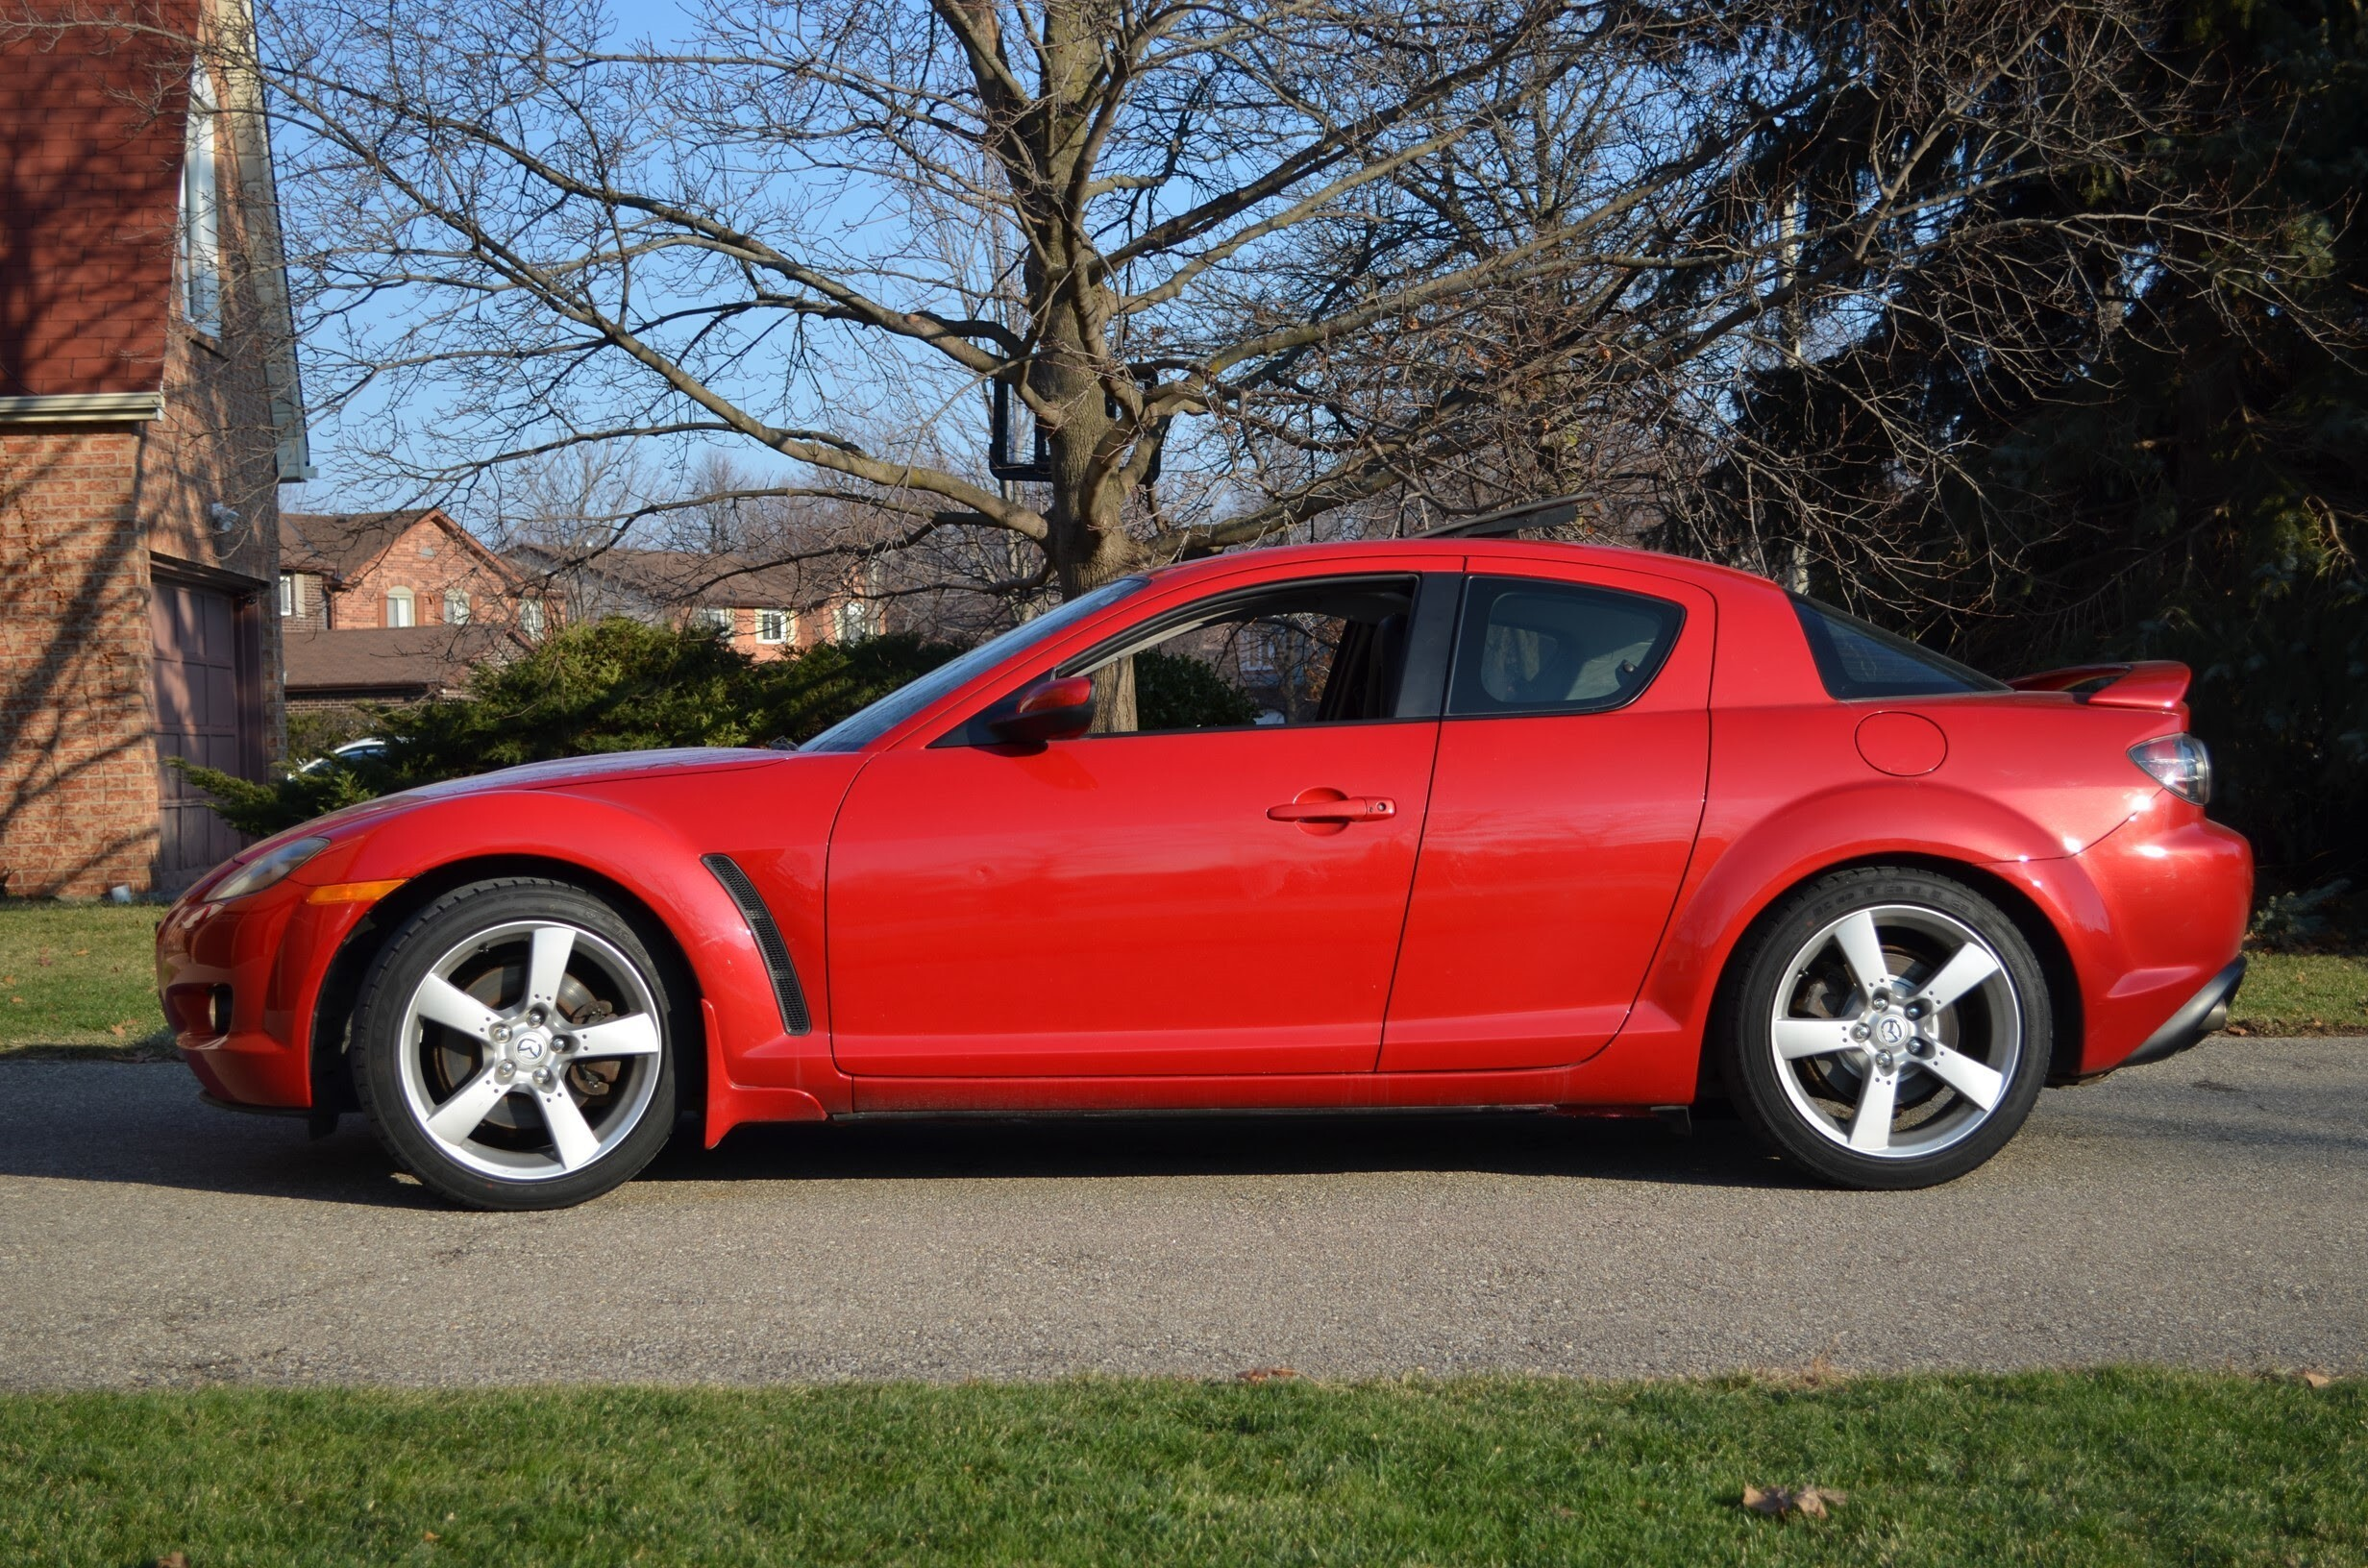 2006 Mazda RX-8 4dr Cpe GT Manual - Brampton